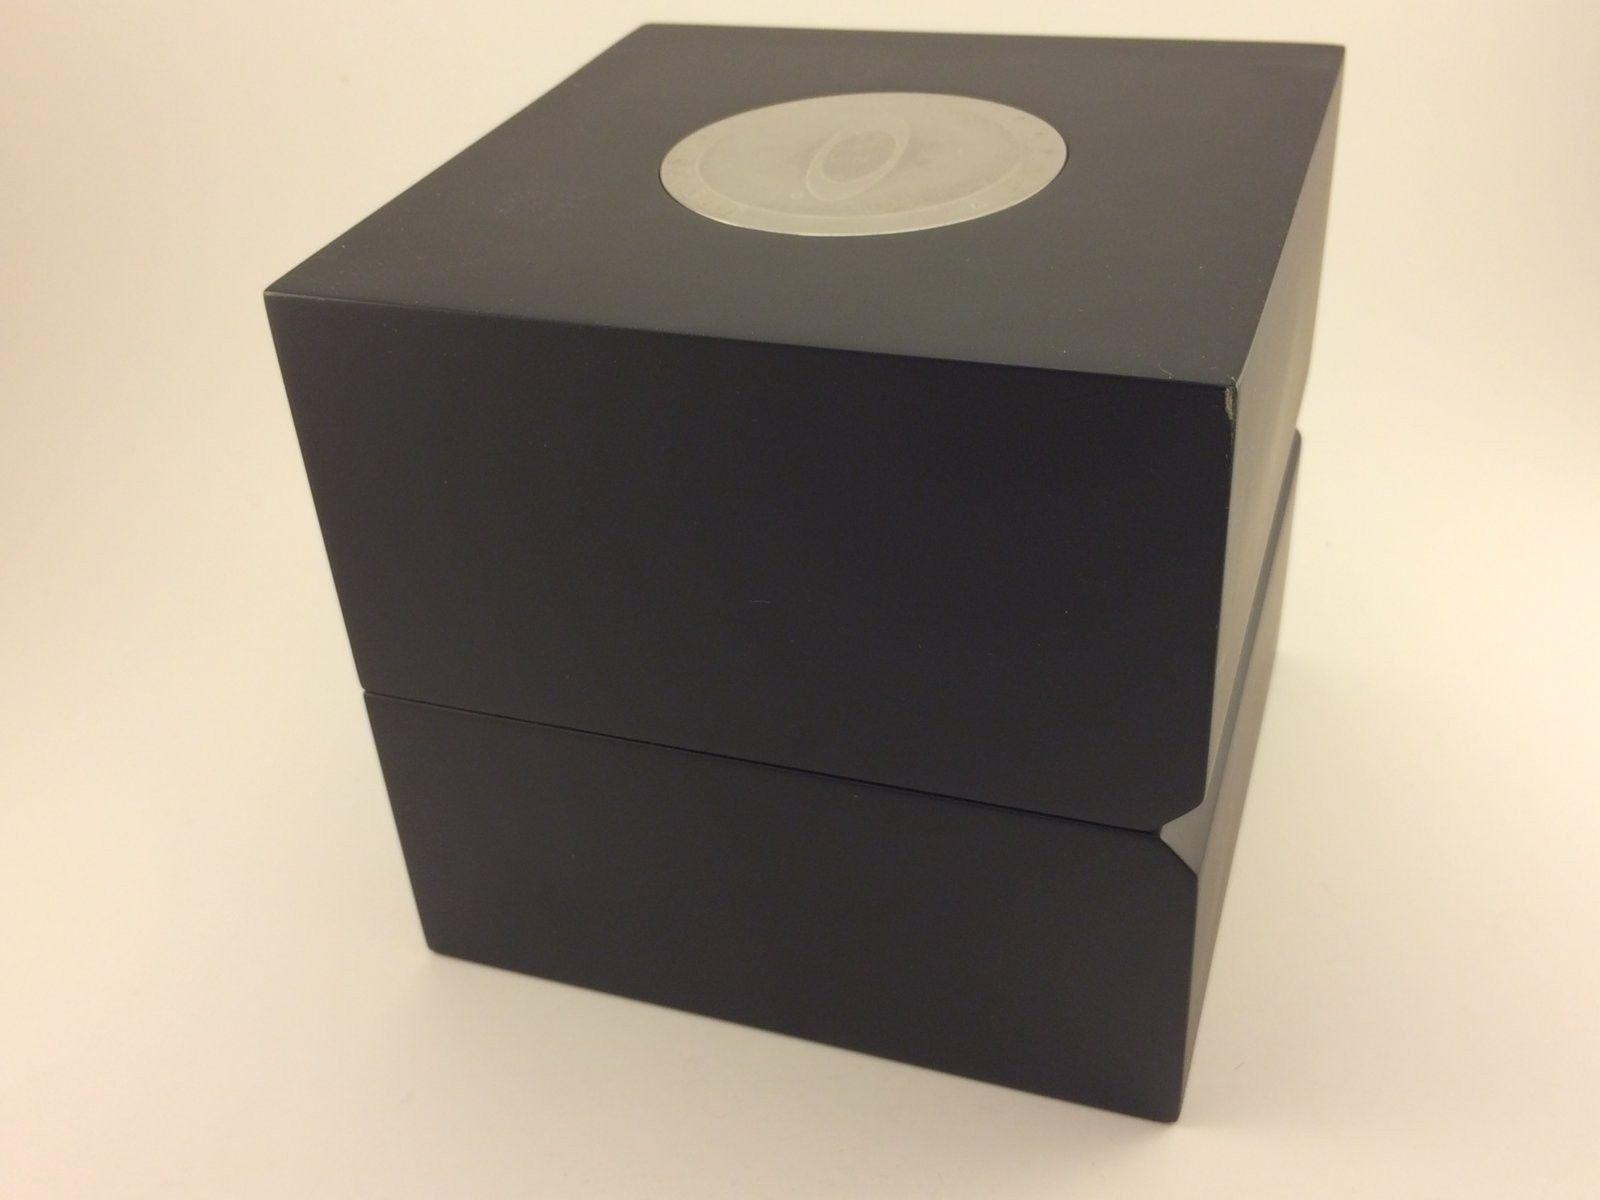 Minute Machine Wooden Box - MM box 701.JPG